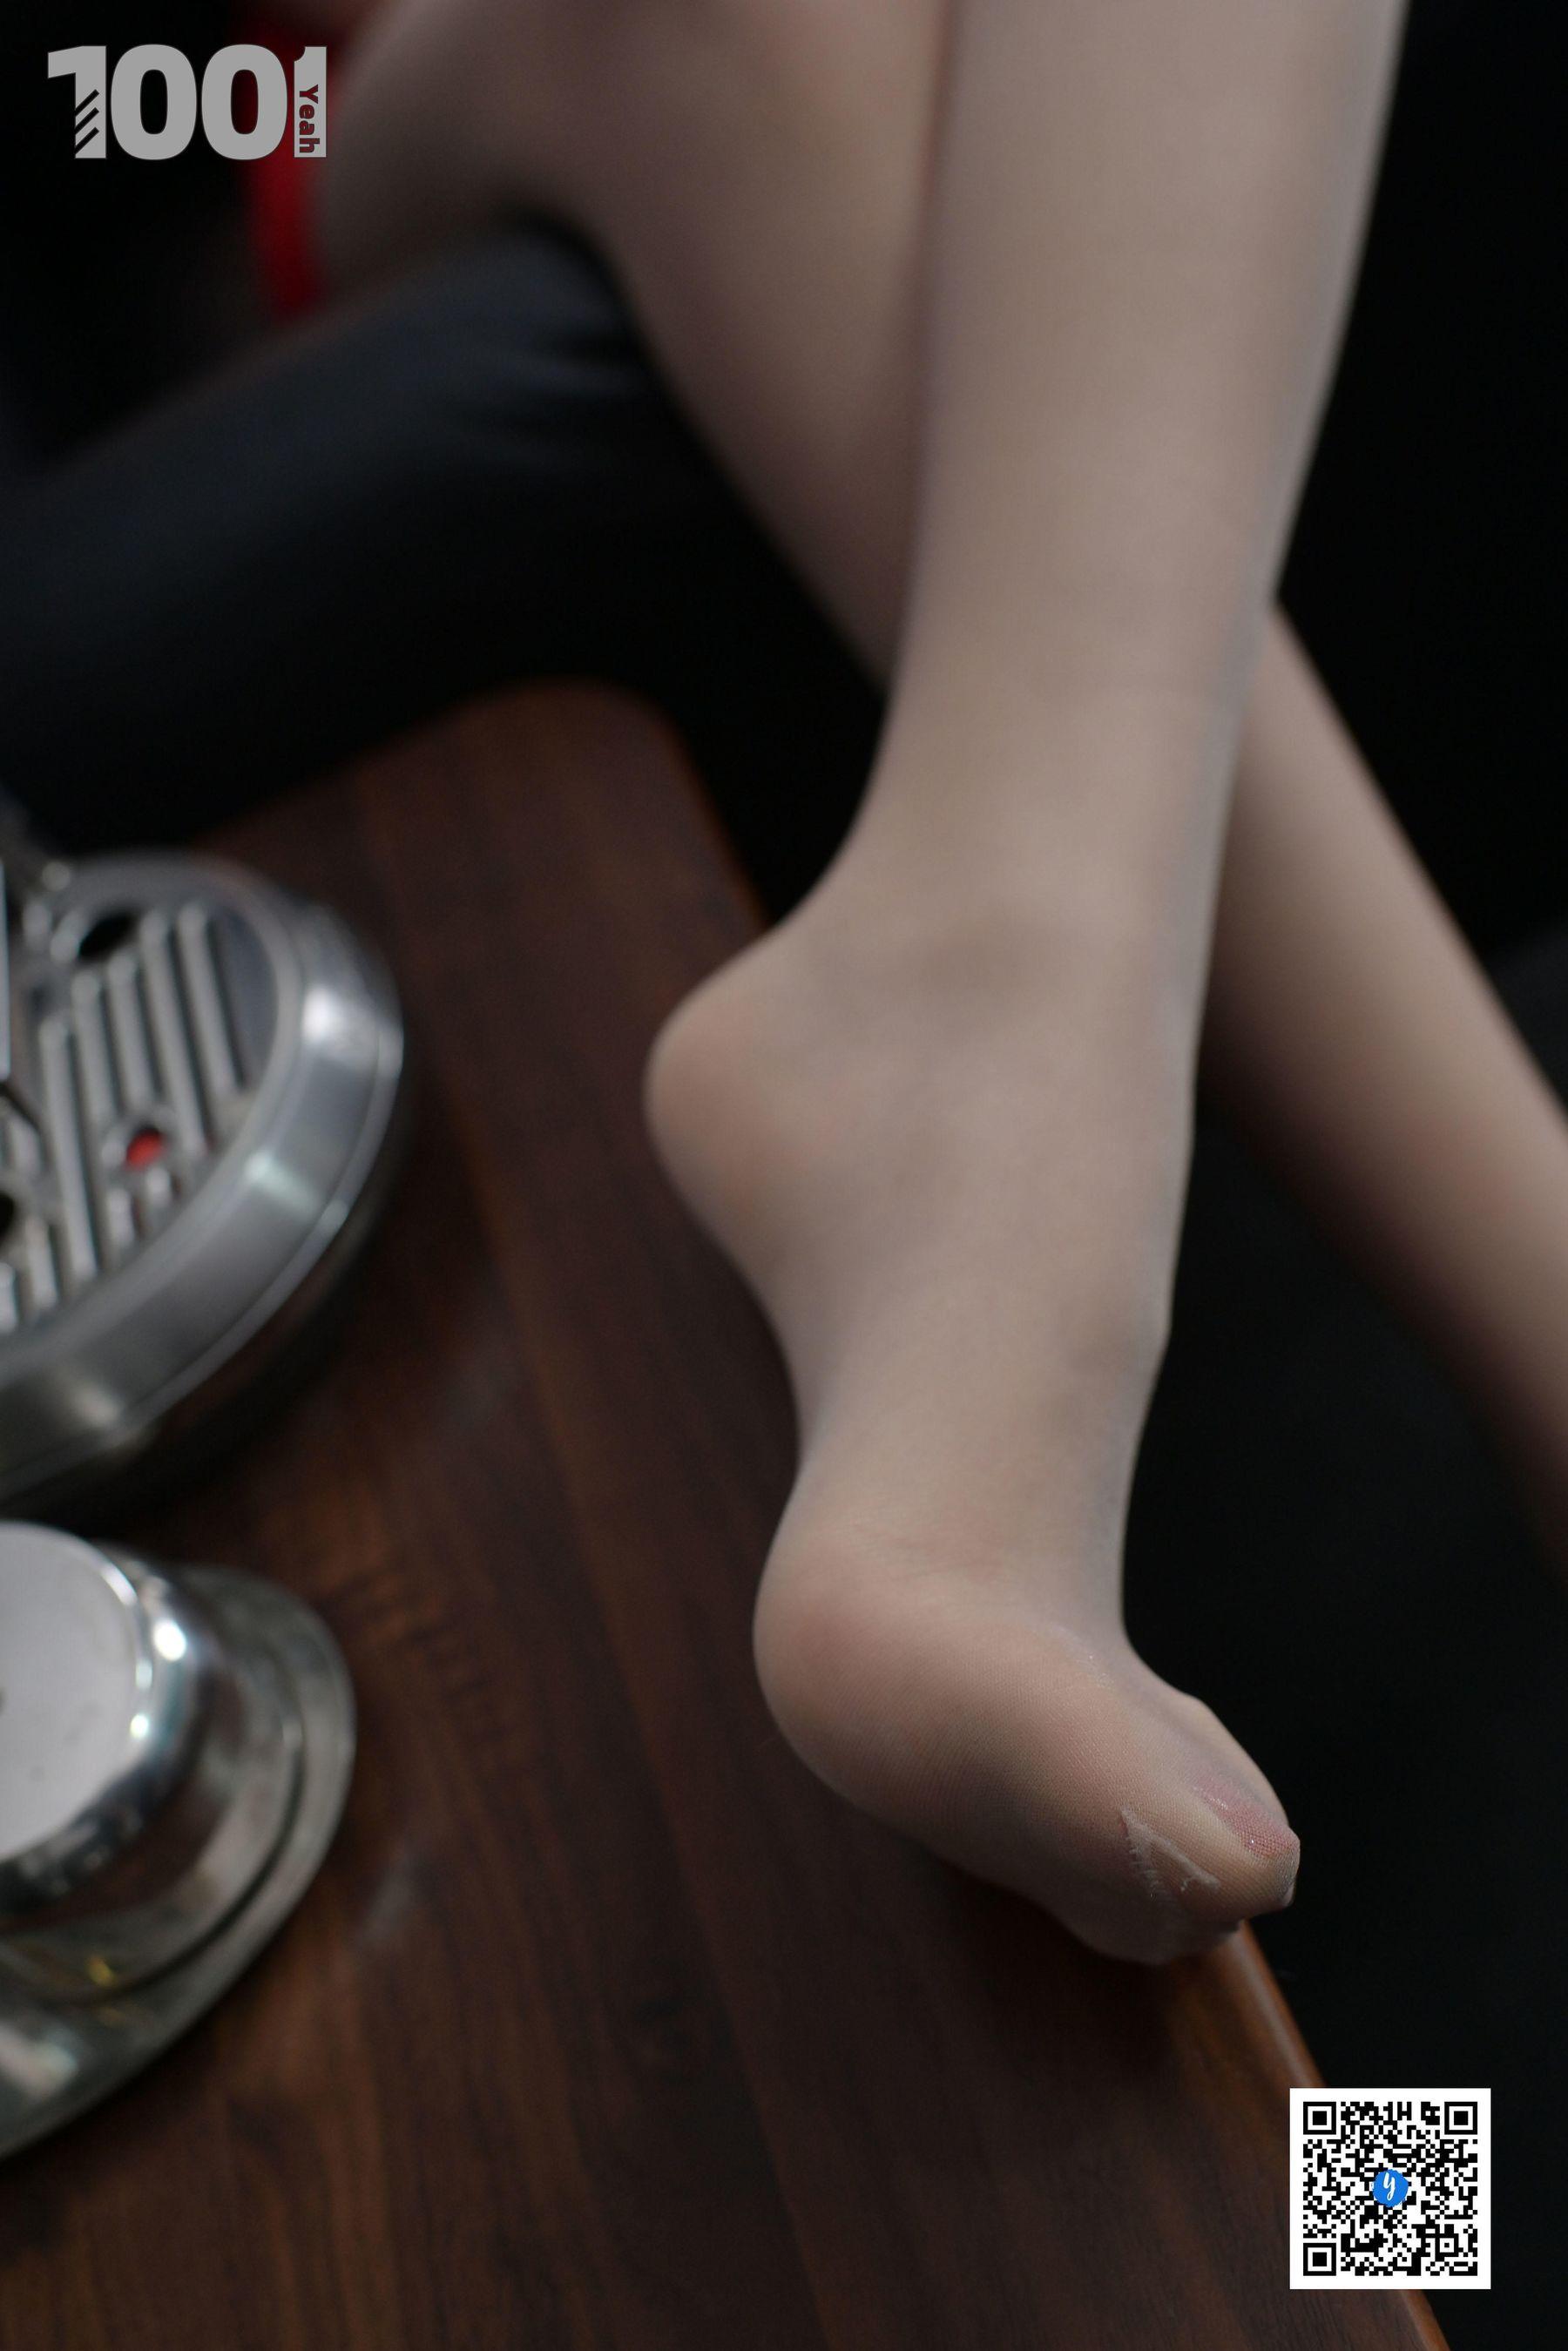 [IESS] NO.188 【一抹红2】 丝足美腿写真[90P]插图(9)